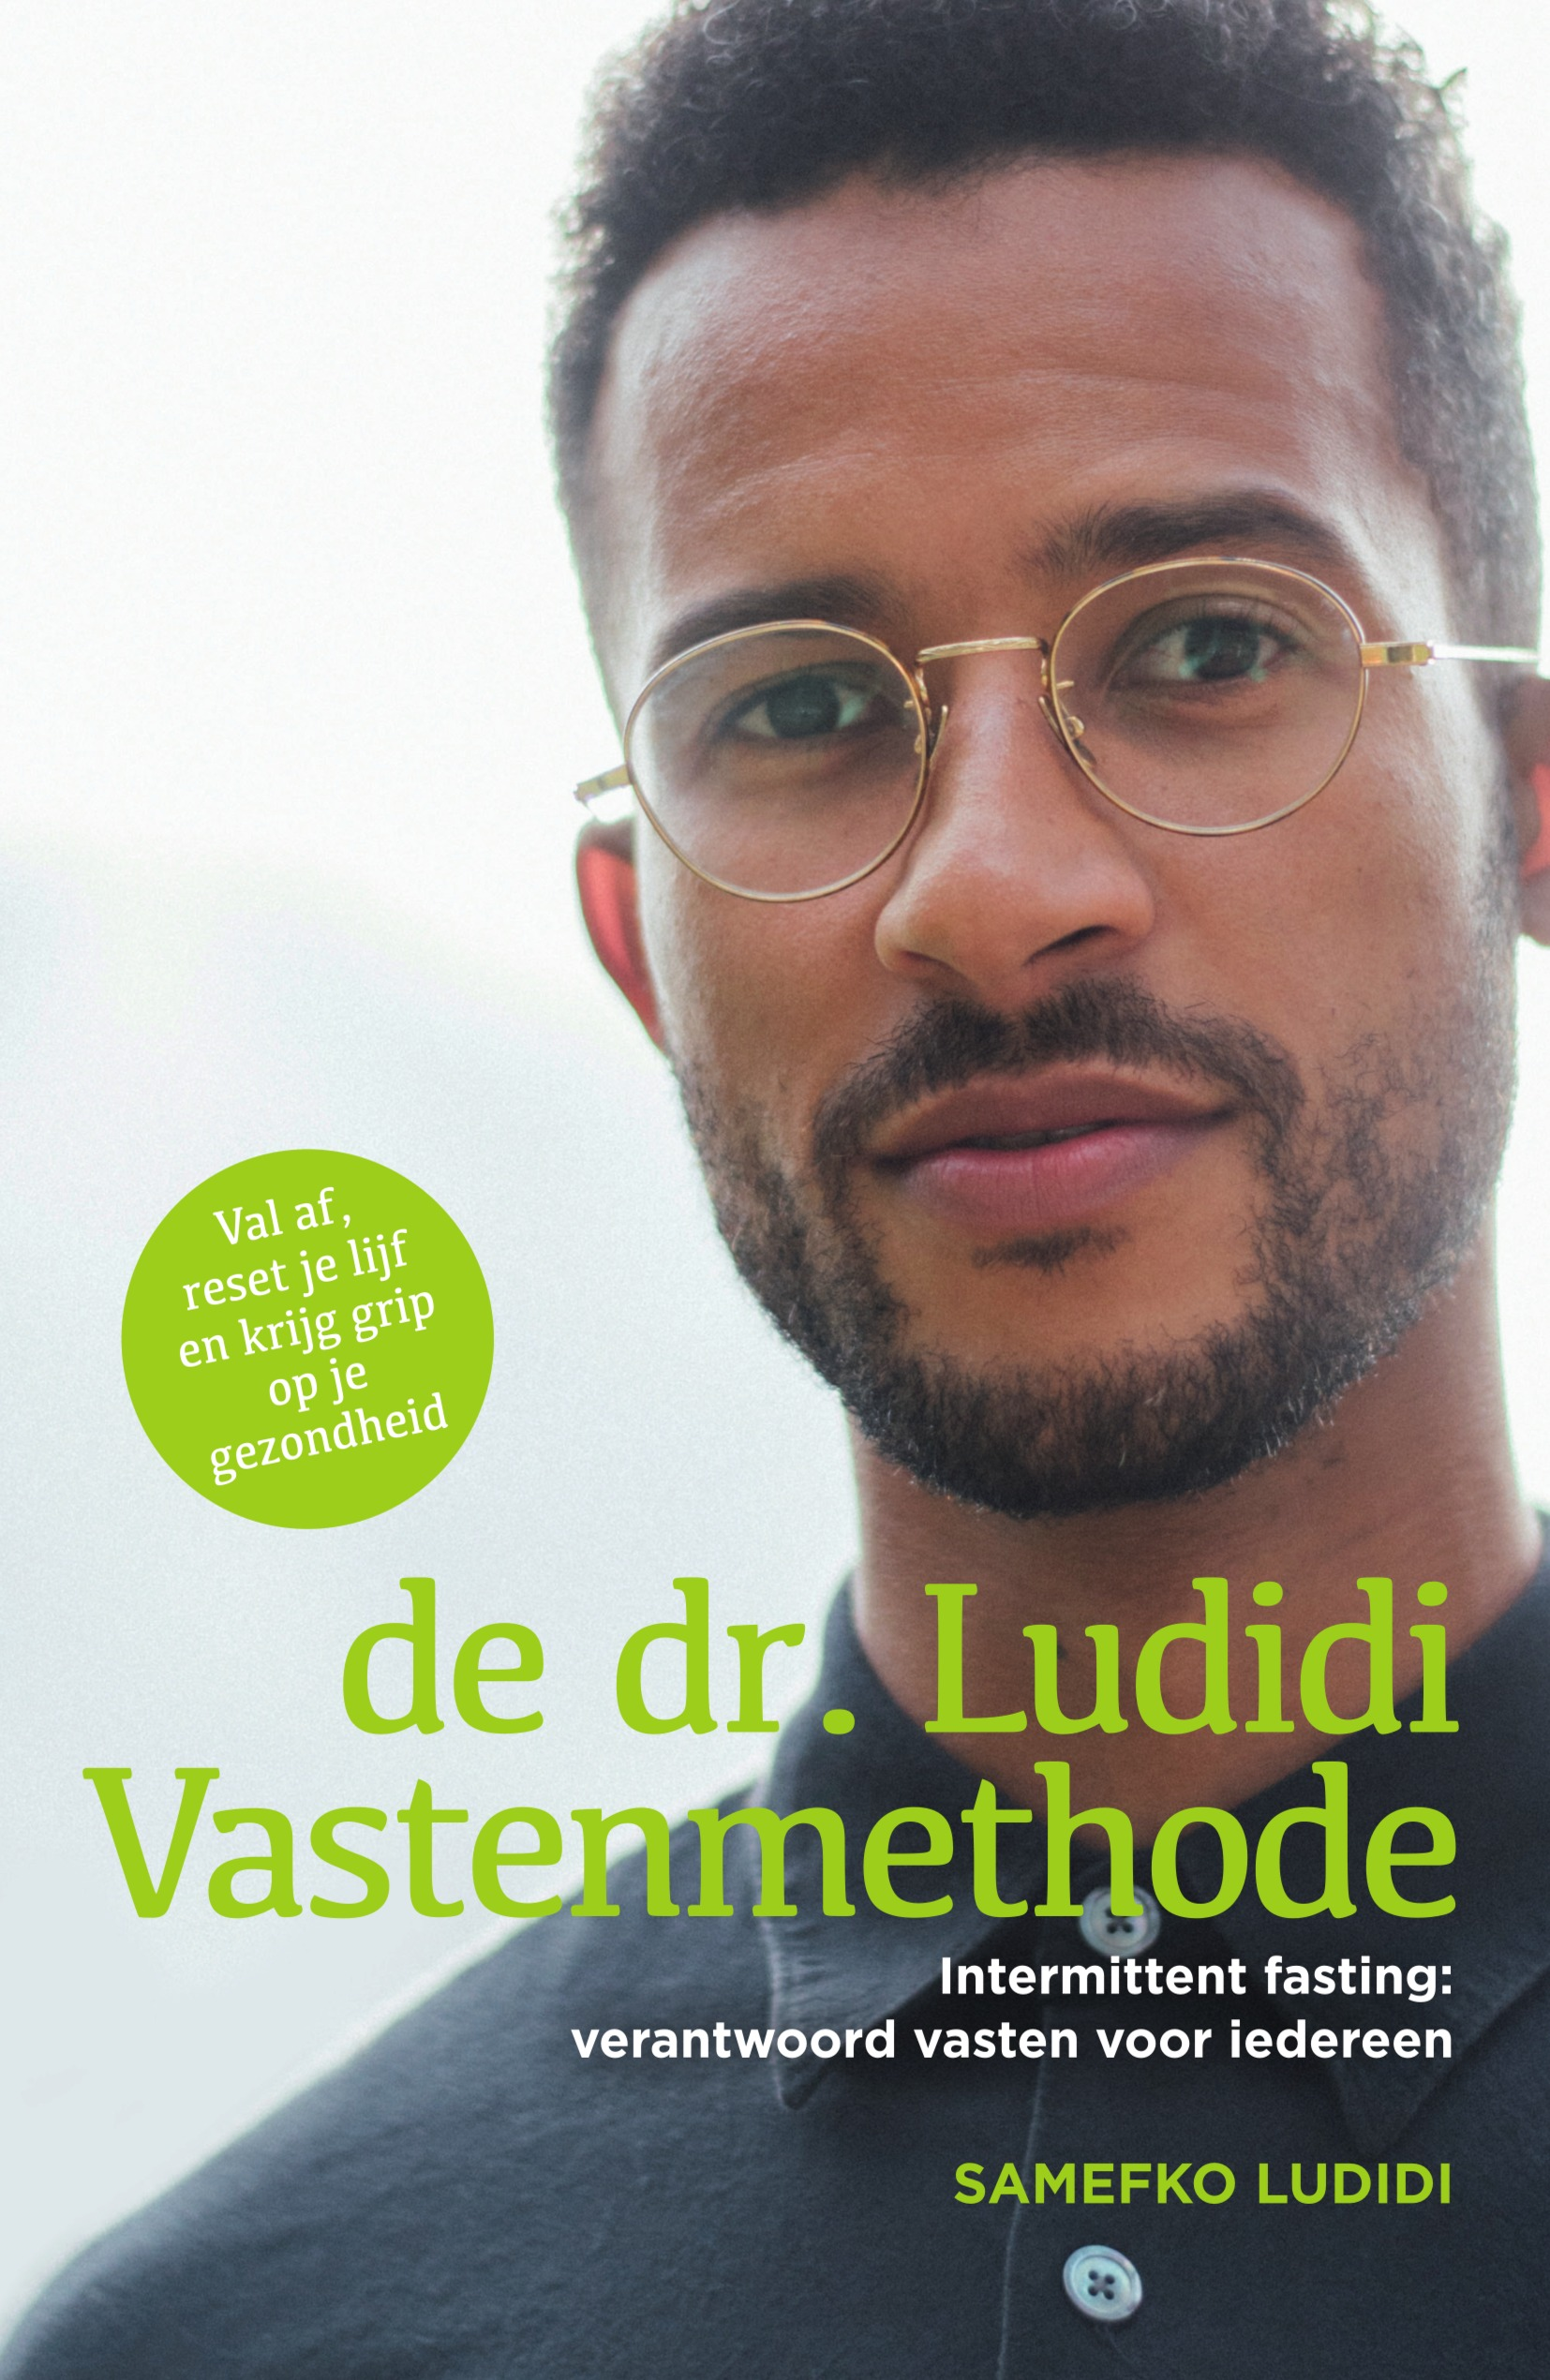 De dr. Ludidi Vastenmethode